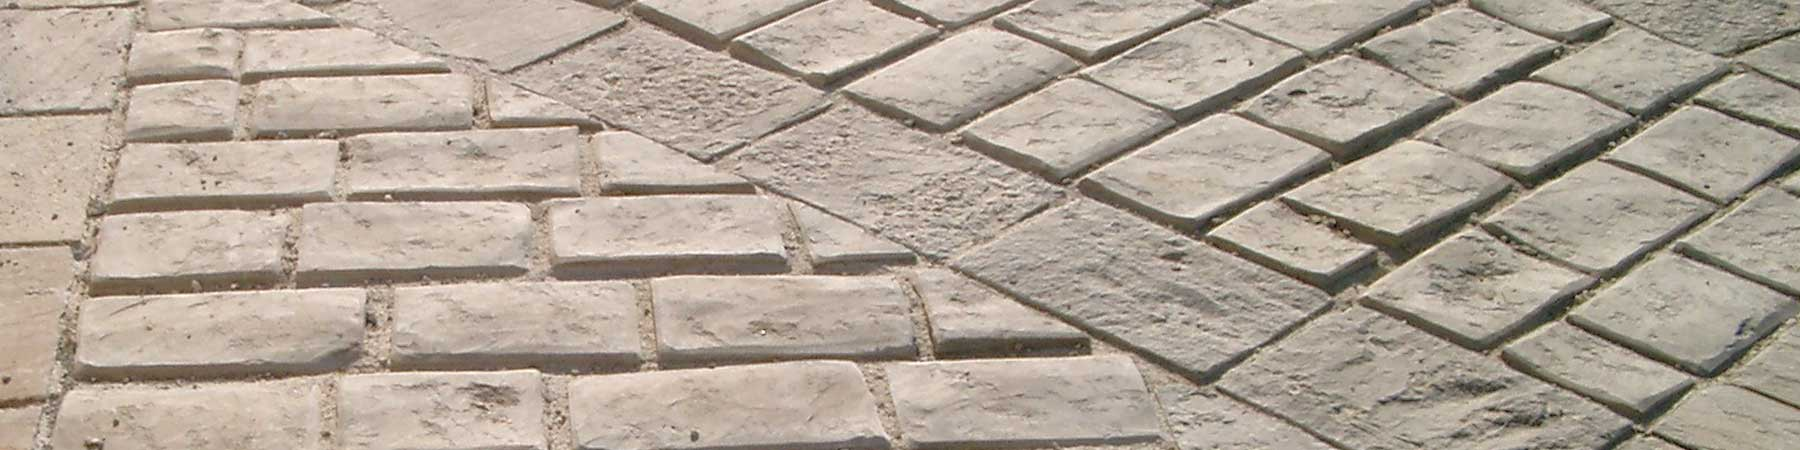 Adoqu n piedras naturales baigorri - Adoquin de piedra ...